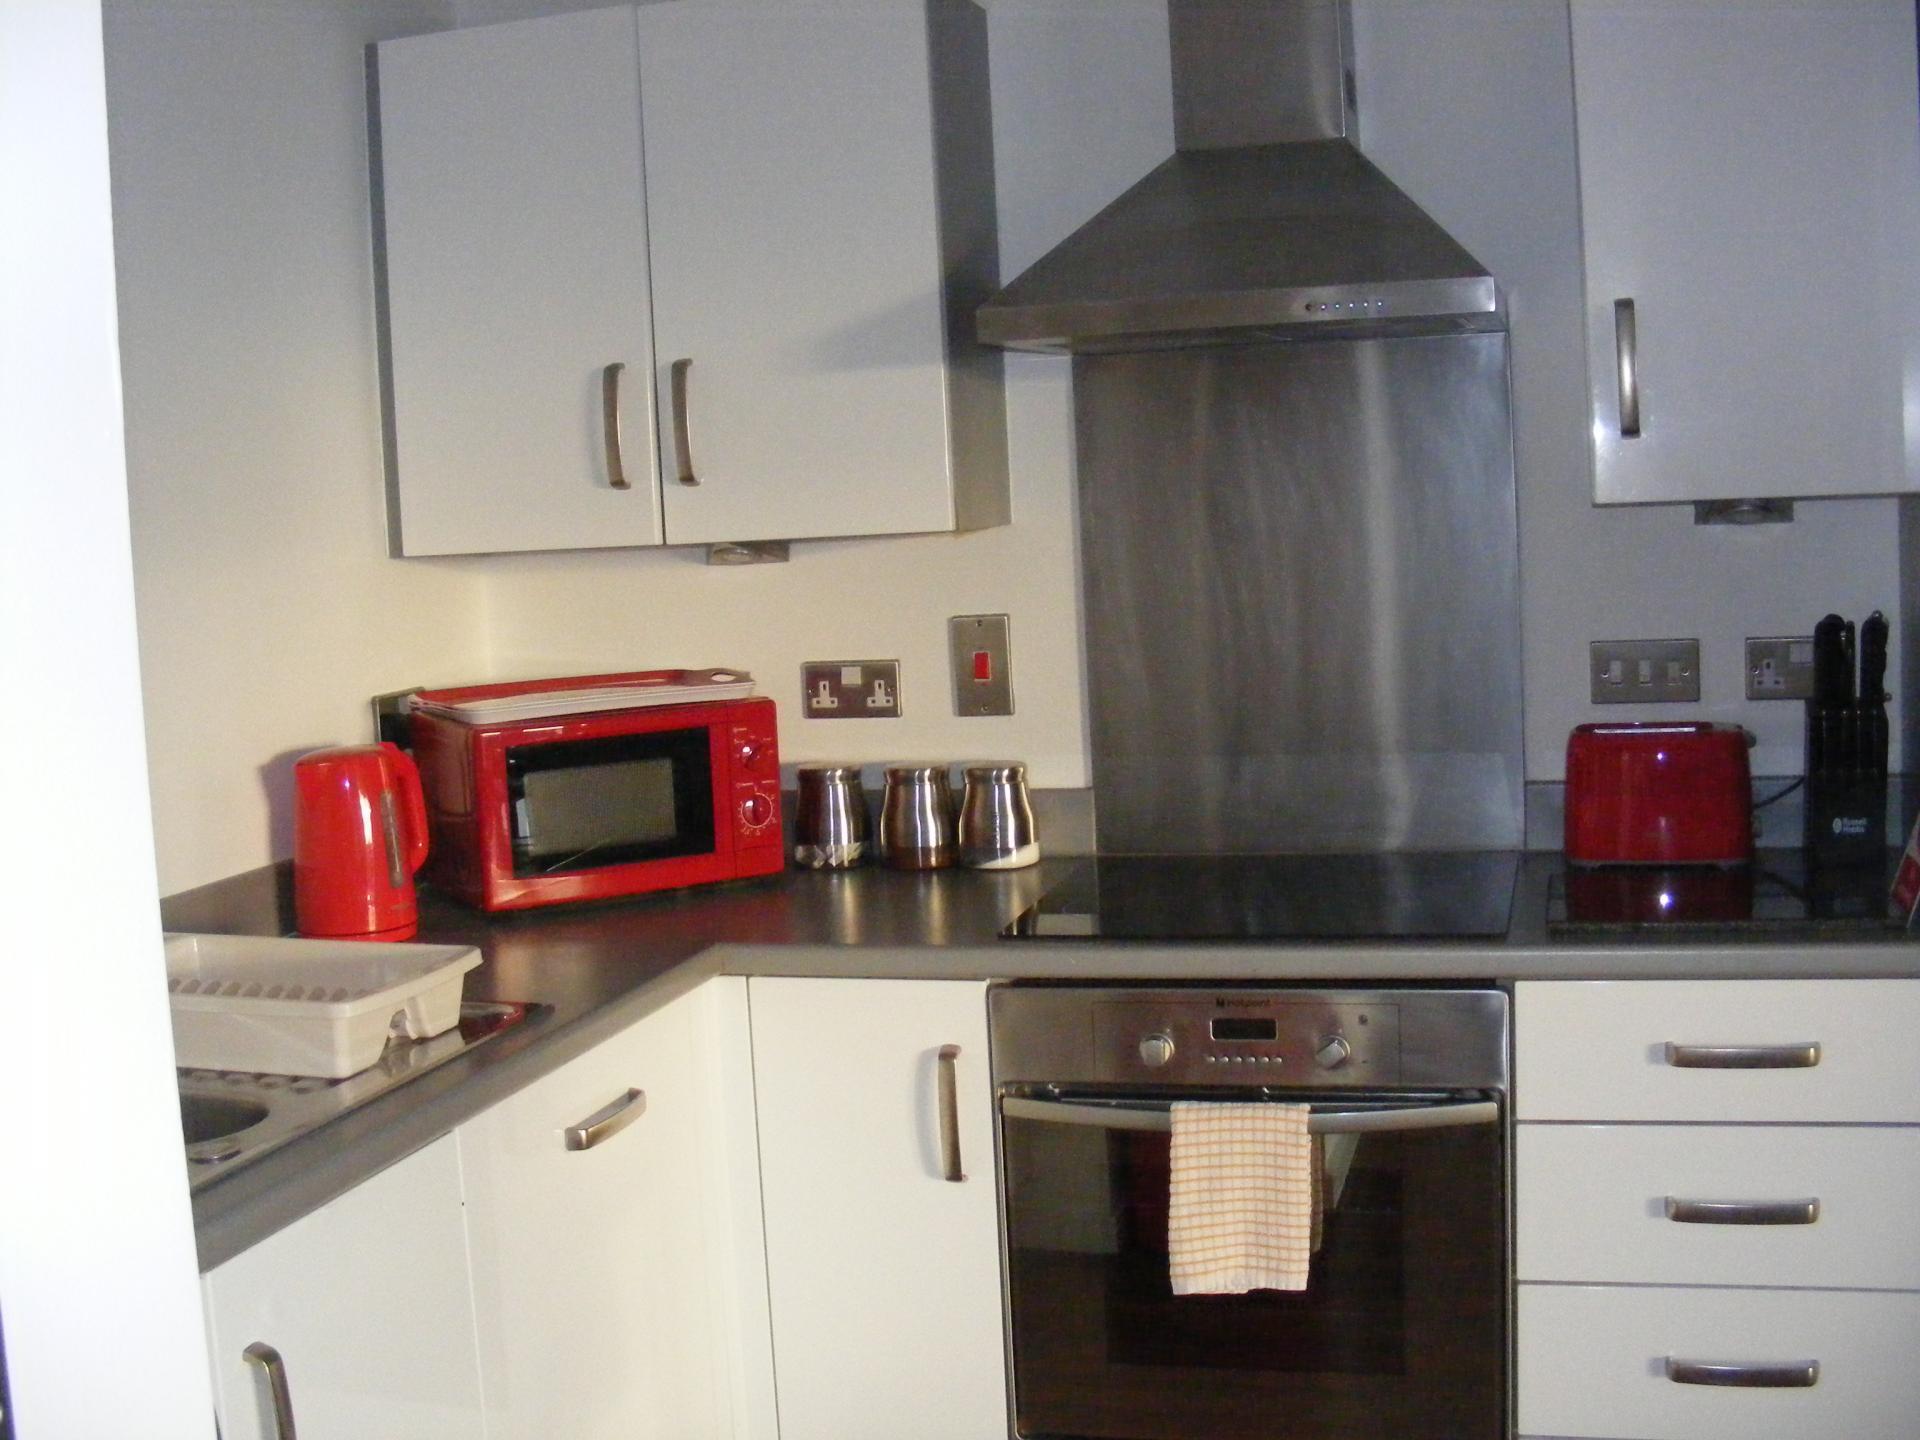 Kitchen at Baystays Apartments, Centre, Swansea - Citybase Apartments